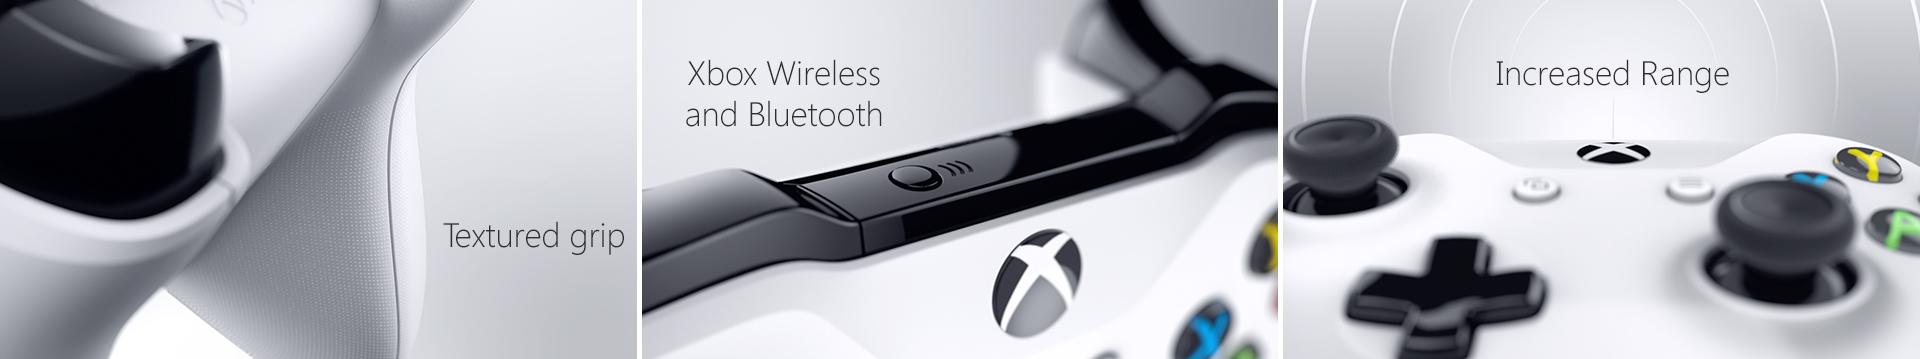 xbox-one-s-microsoft-infobrothers-04